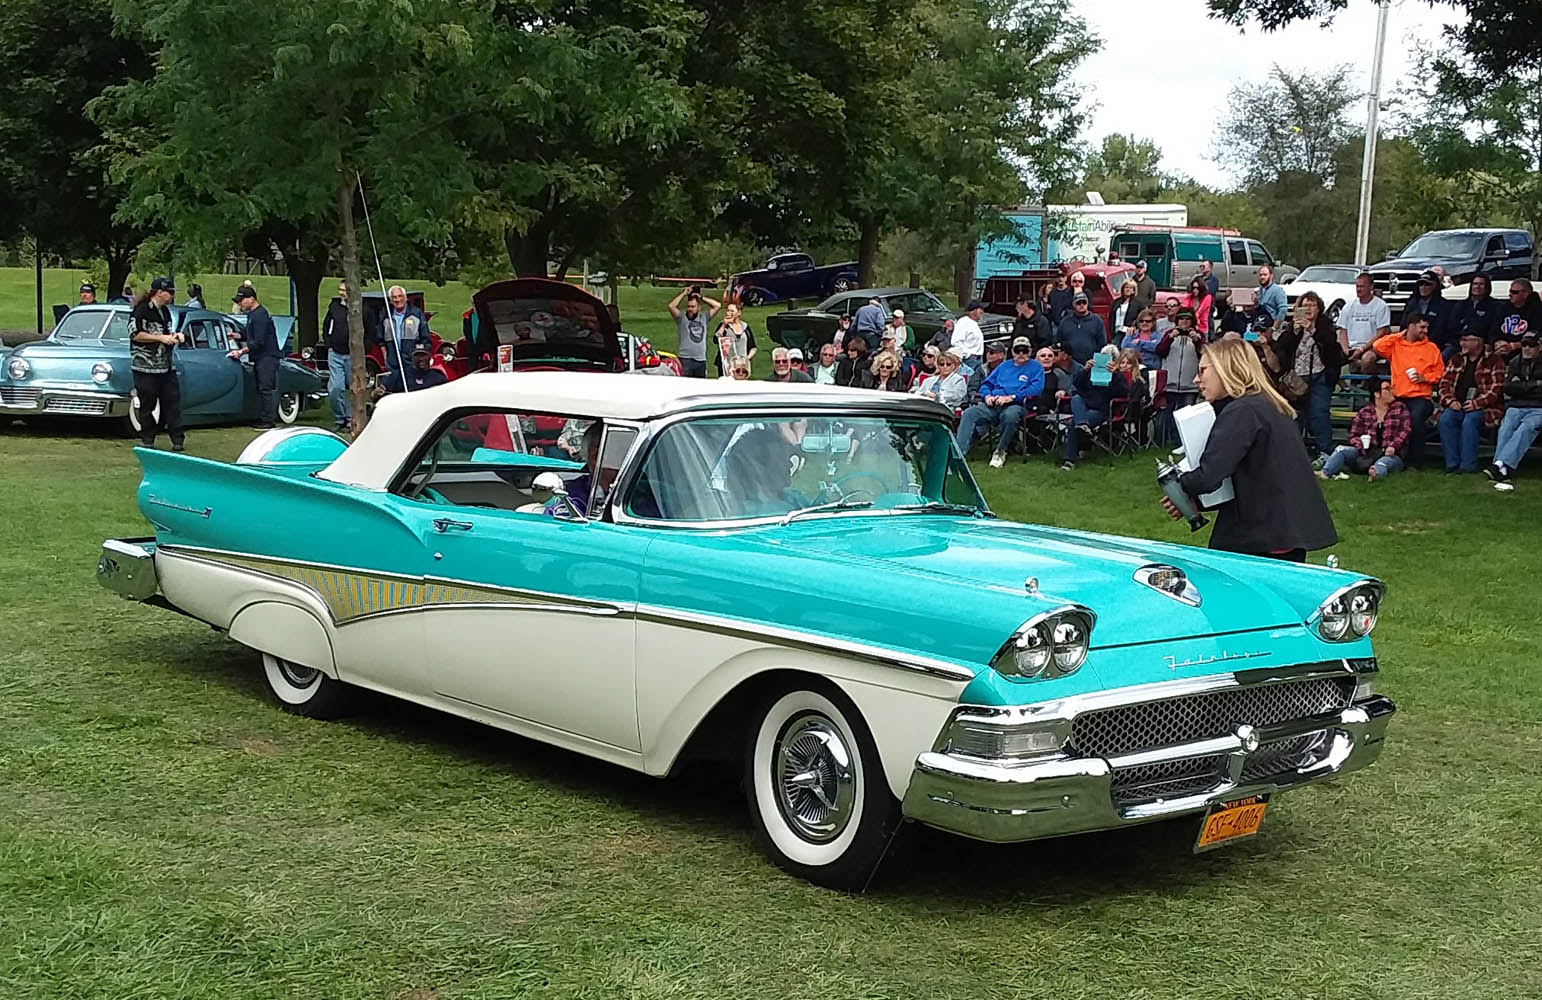 Top 25- 1958 Ford 500 Fairlane Sunliner, Judy Judware 1